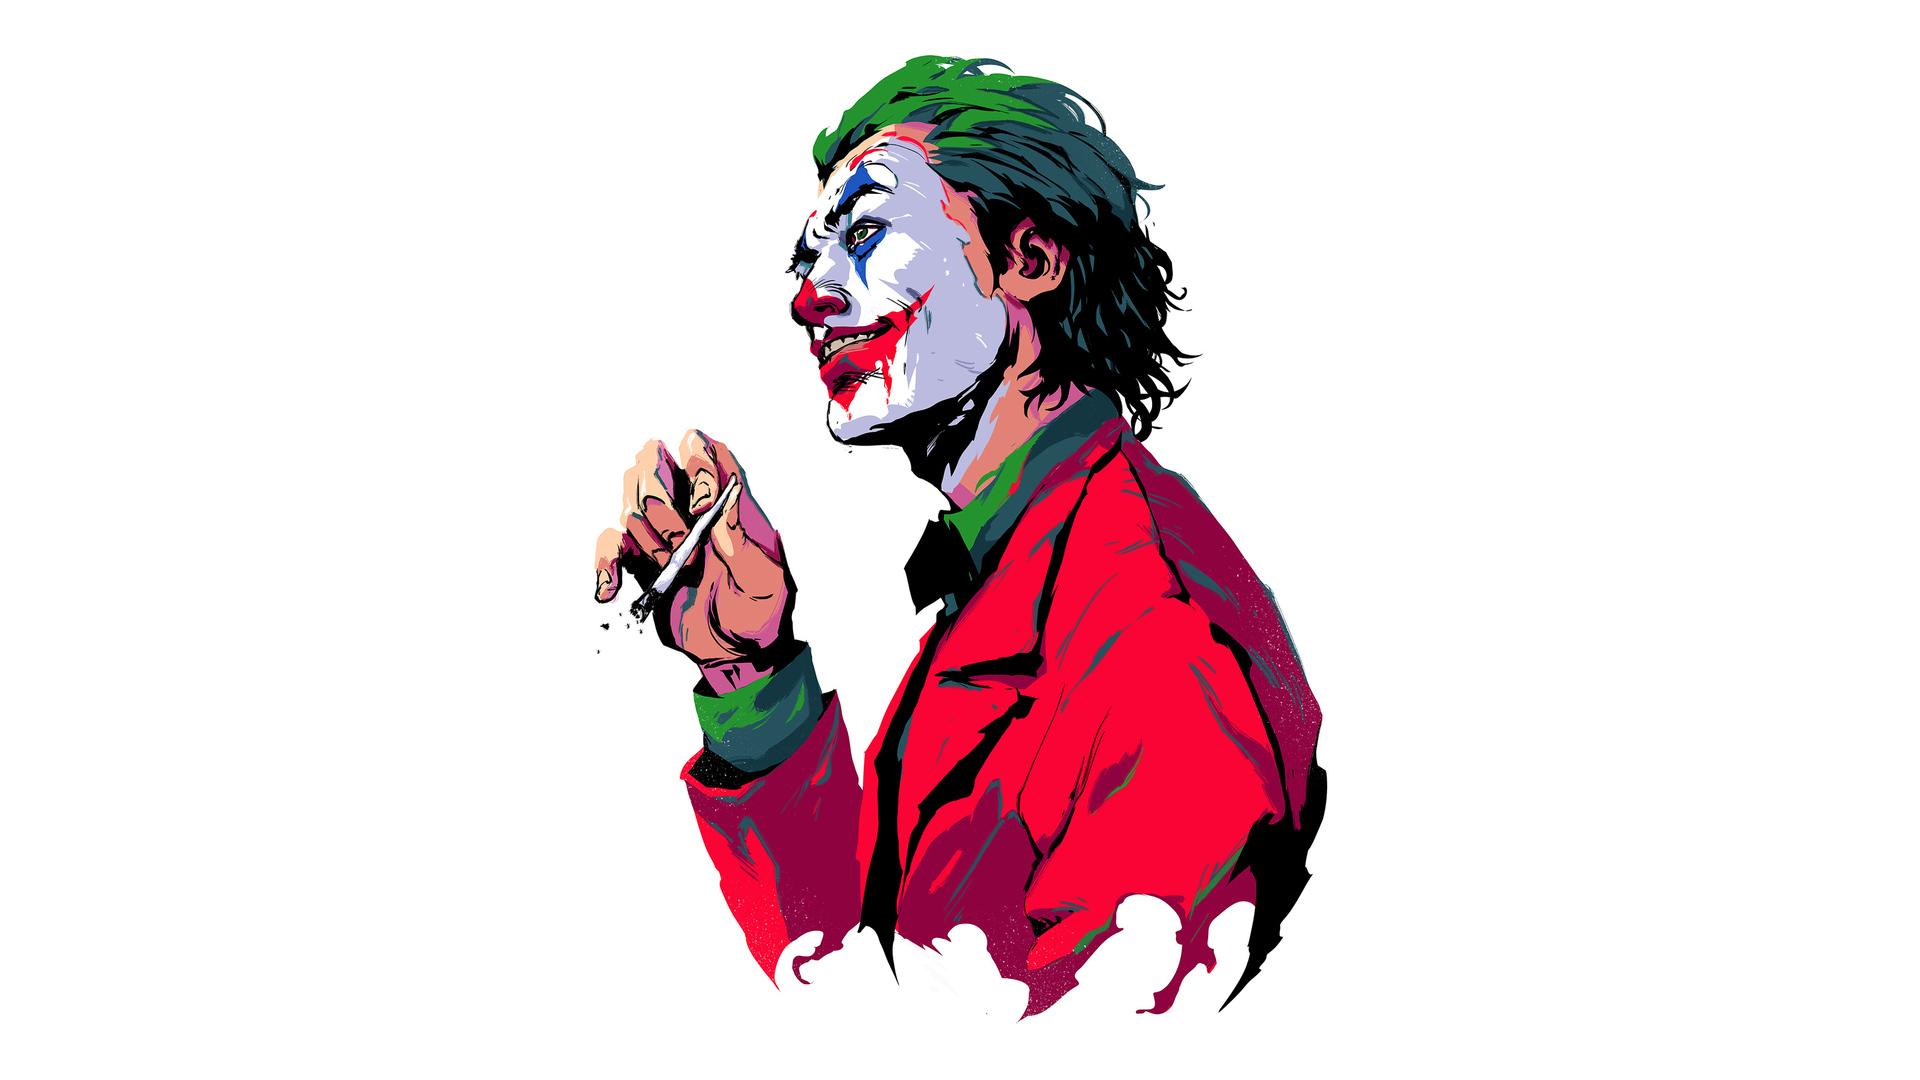 Joker Smoker Boy 4k Wallpaper